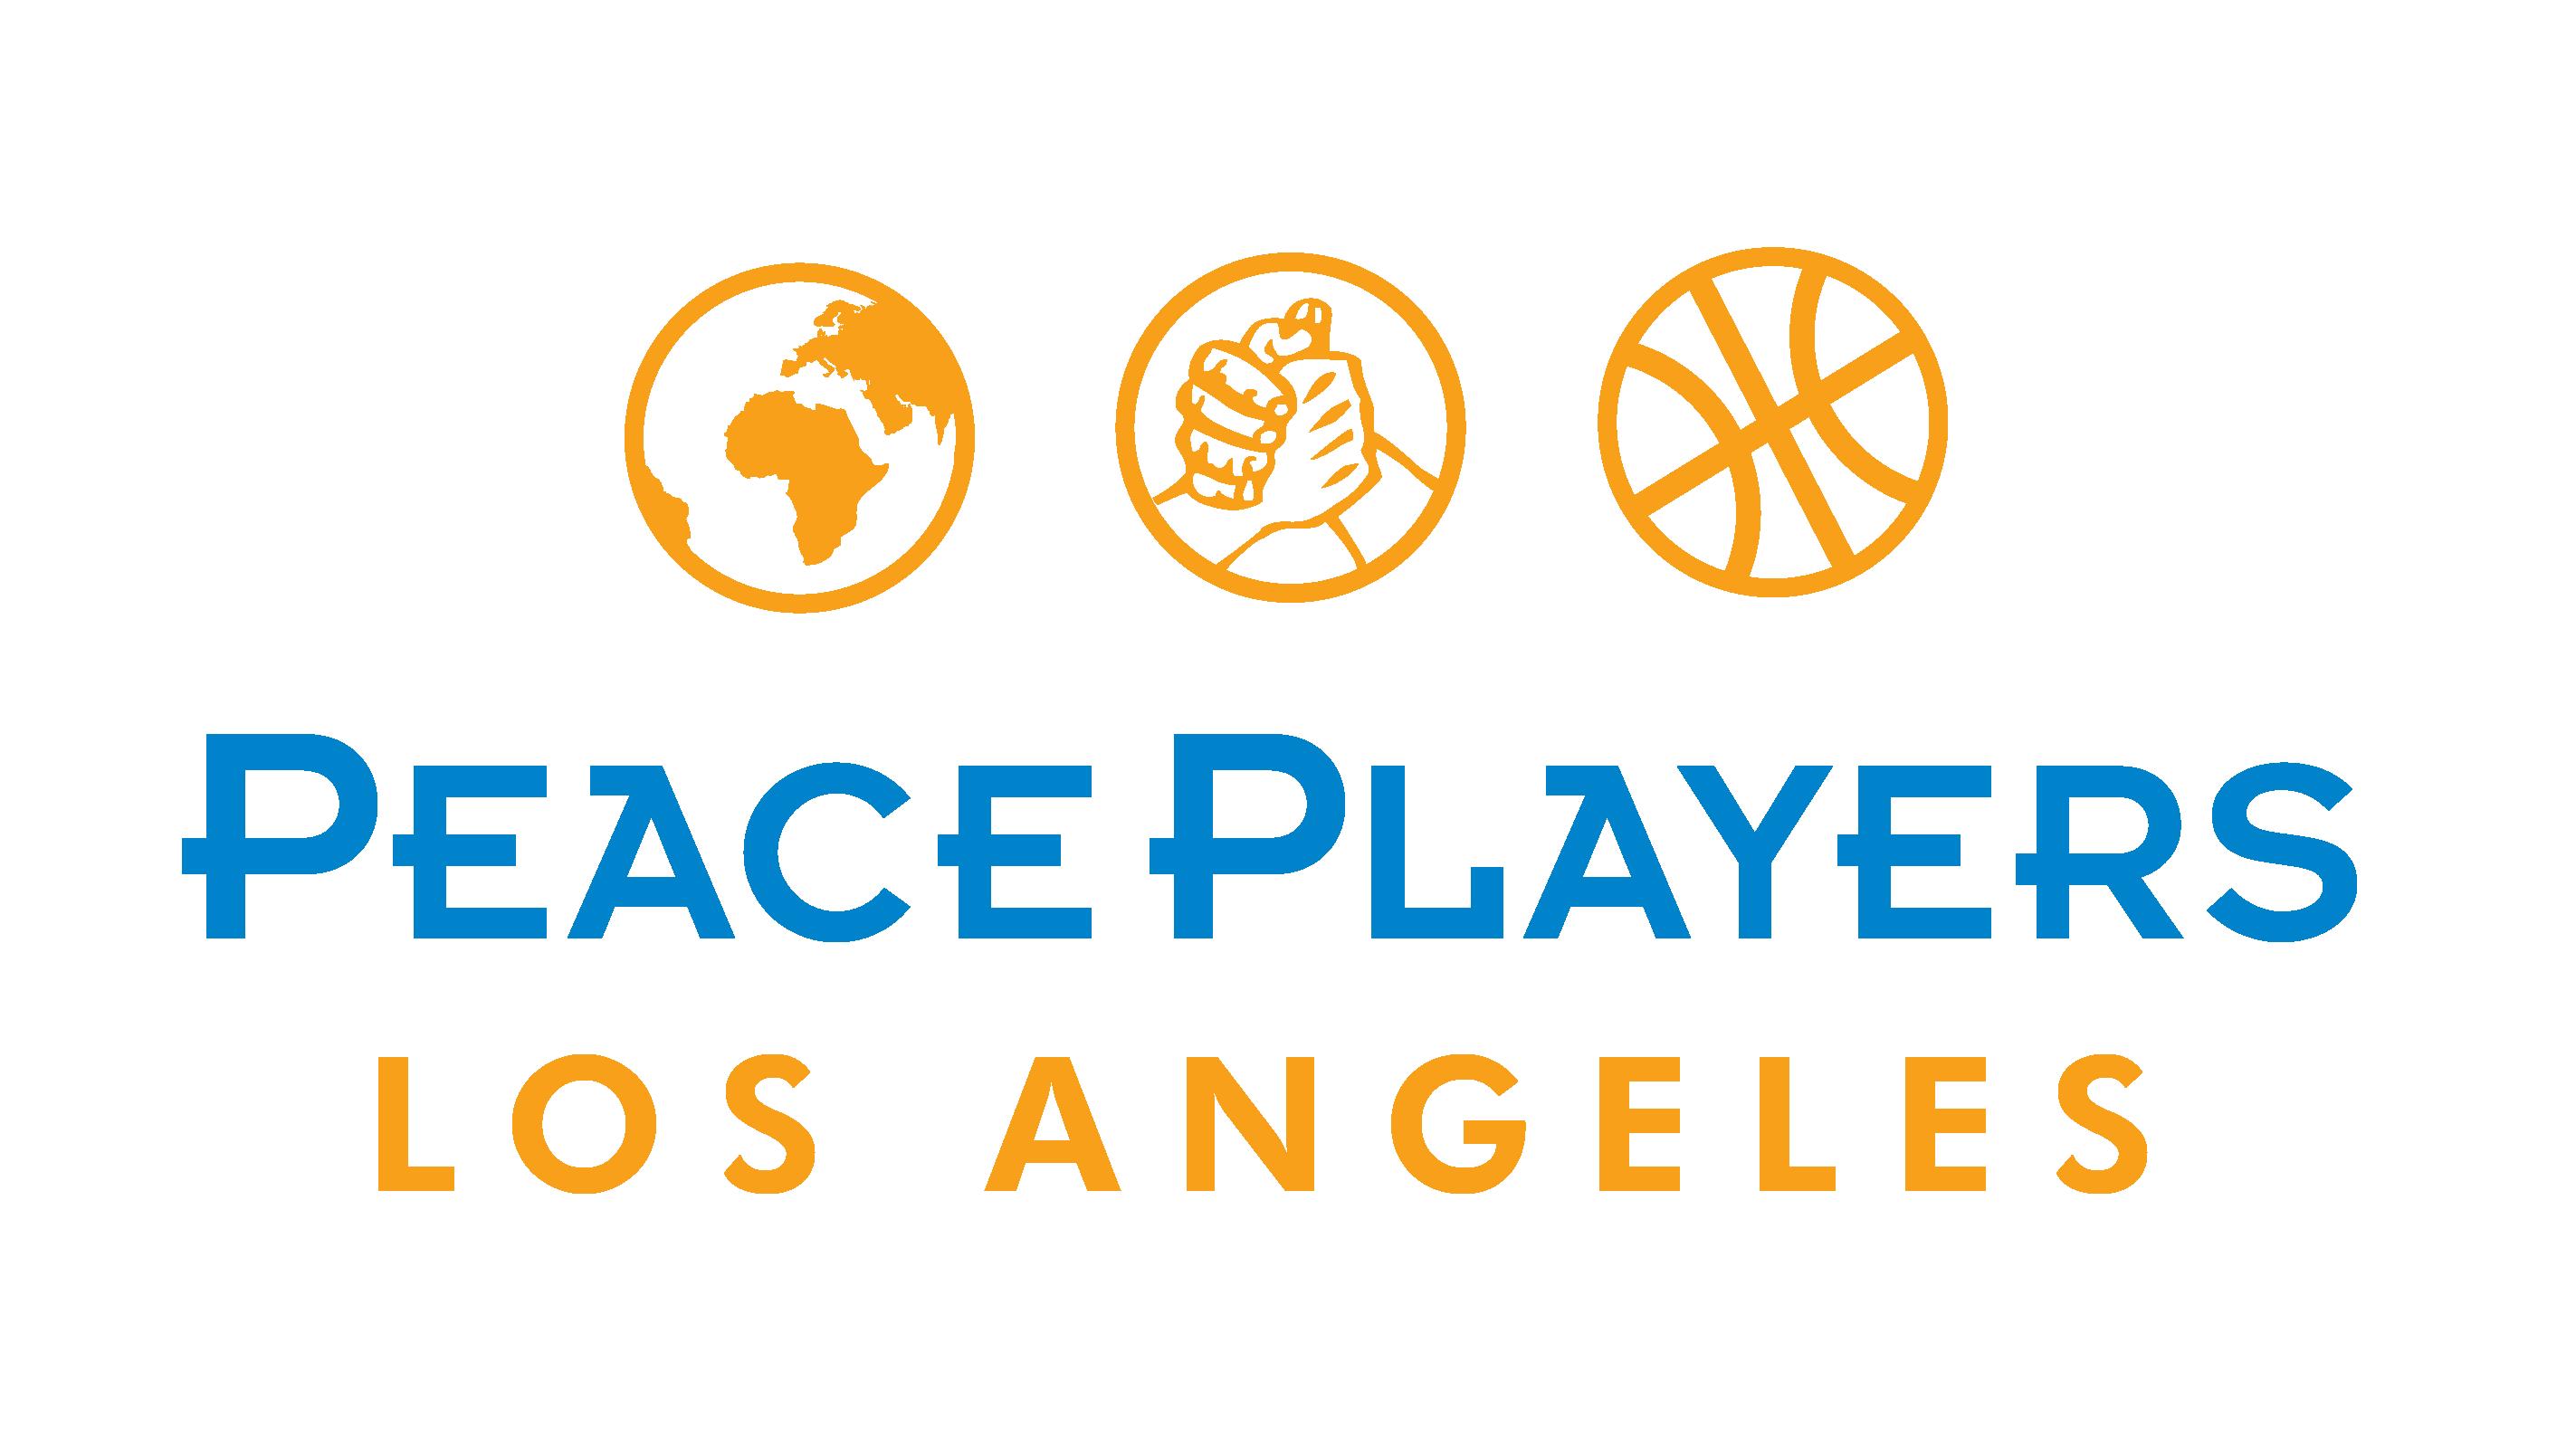 PeacePlayers Los Angeles Logo